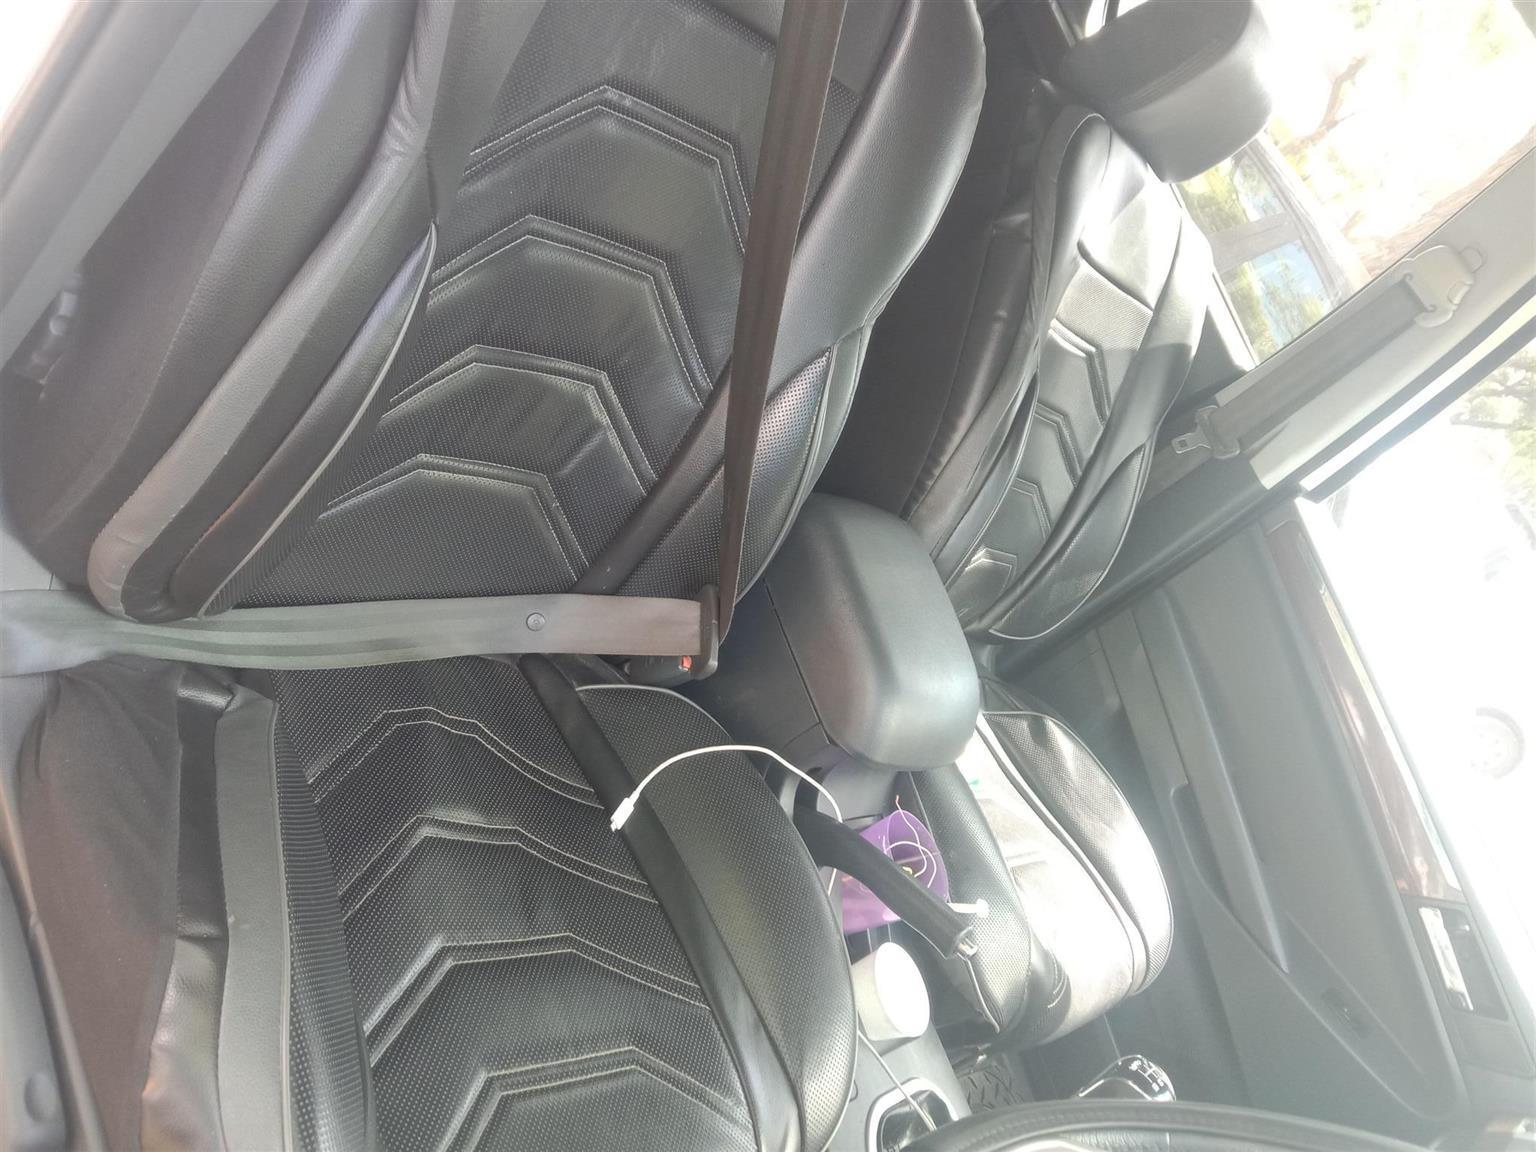 2016 Foton Tunland 2.8 double cab 4x4 Luxury